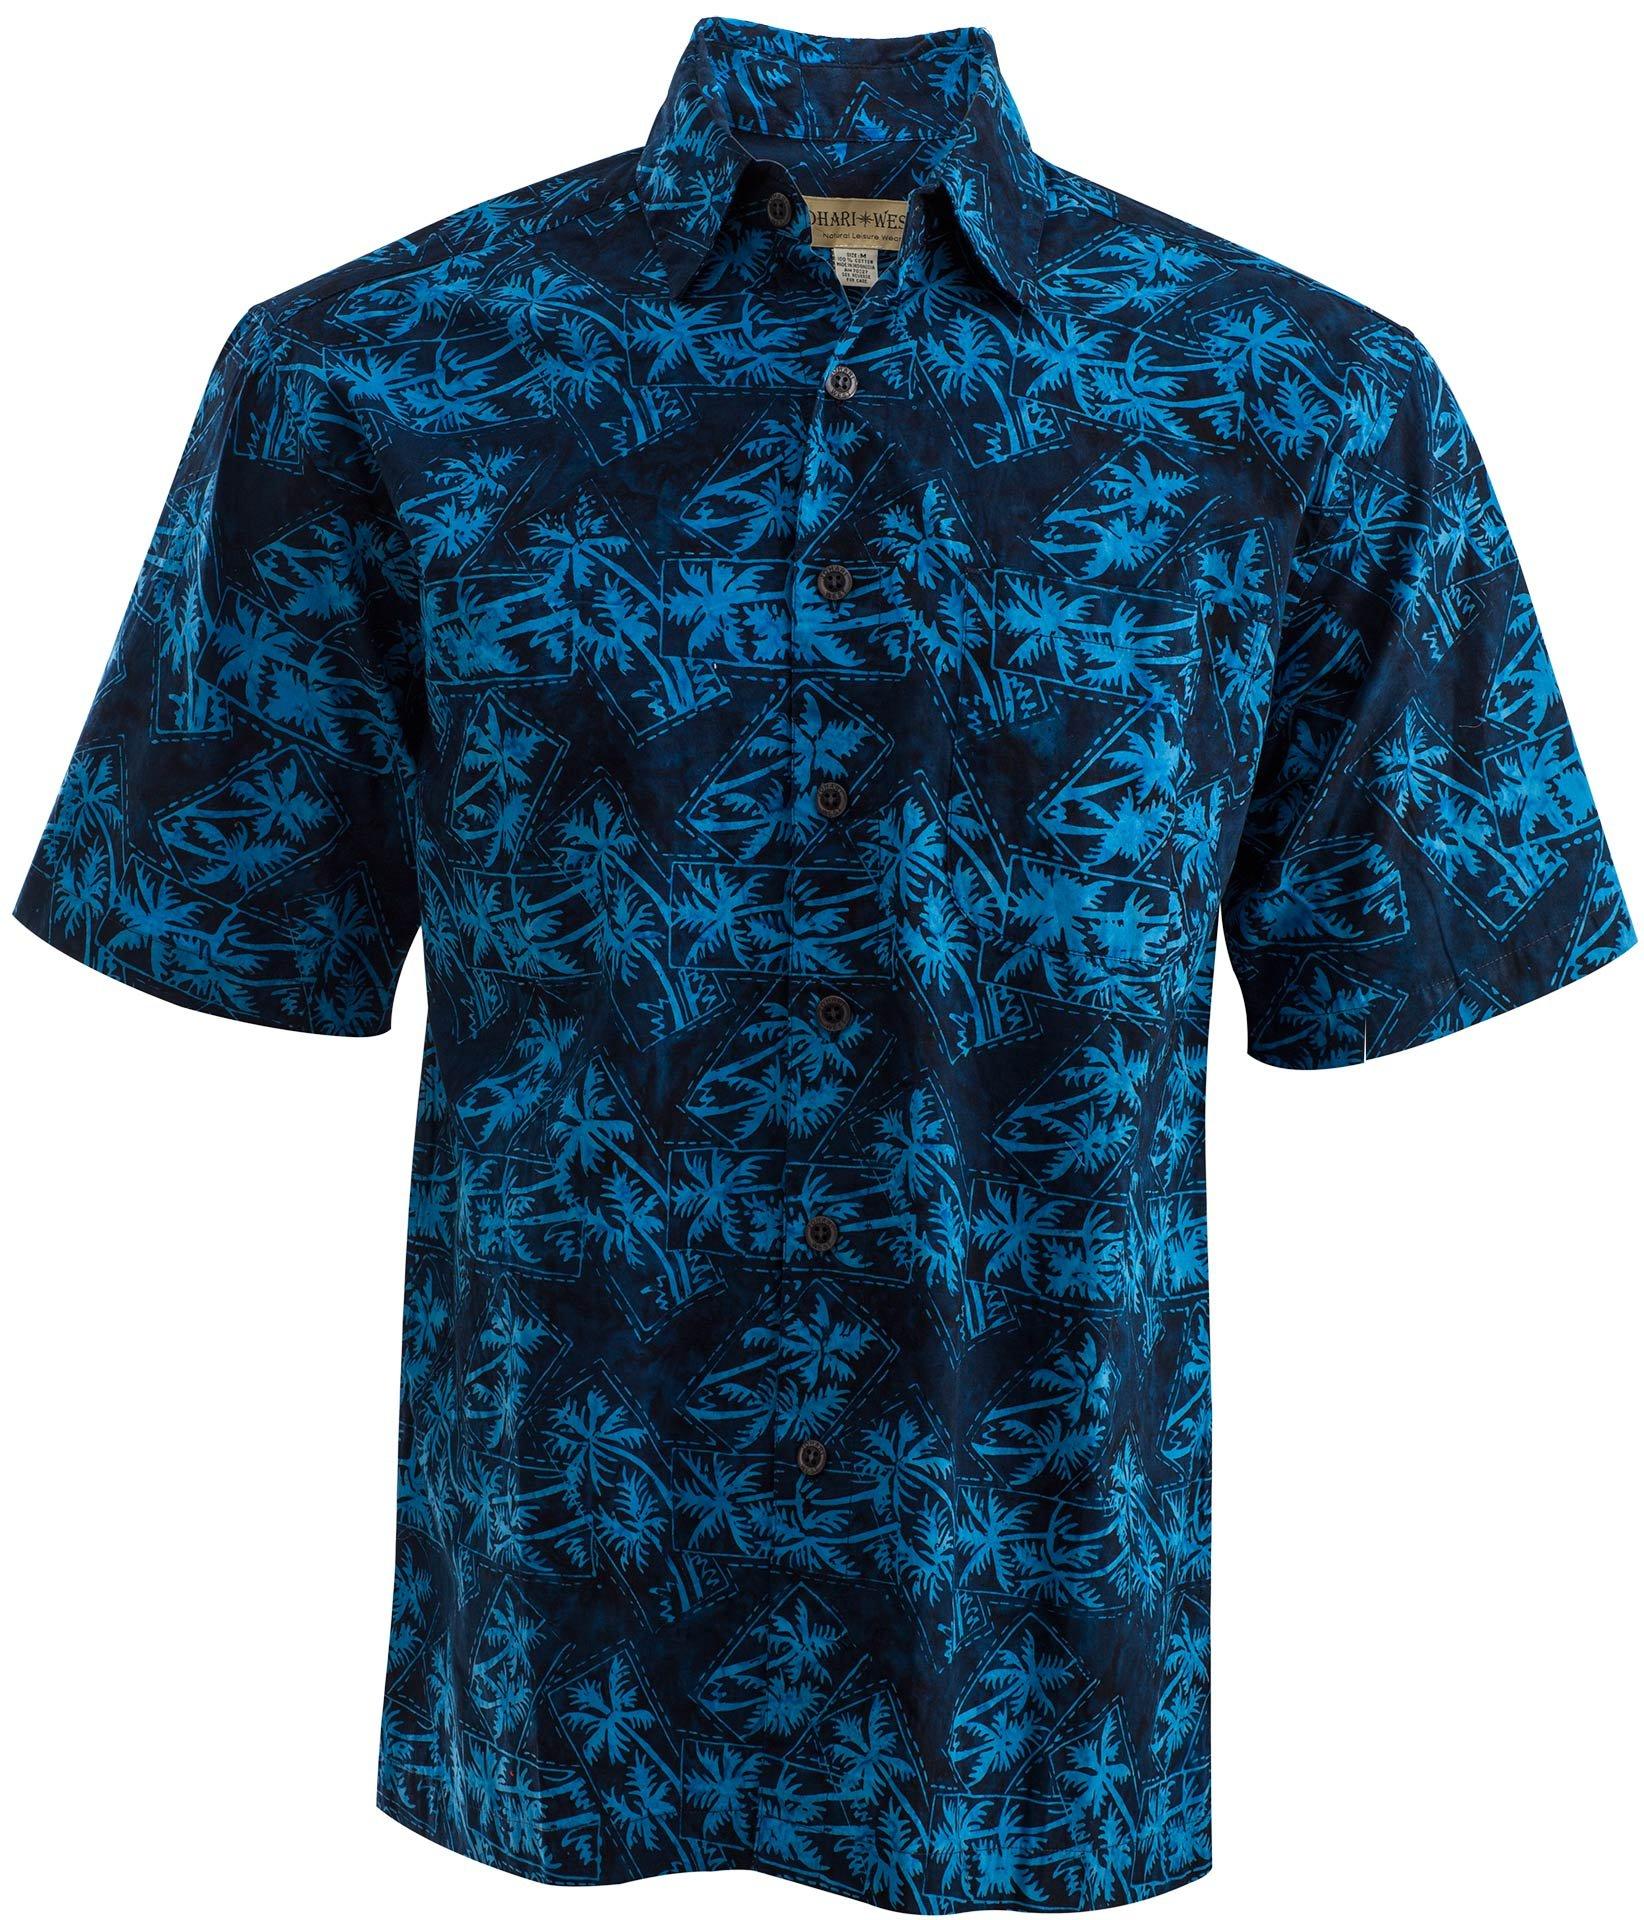 Montego Blue Shirt (M), Blue, Medium, Johari West